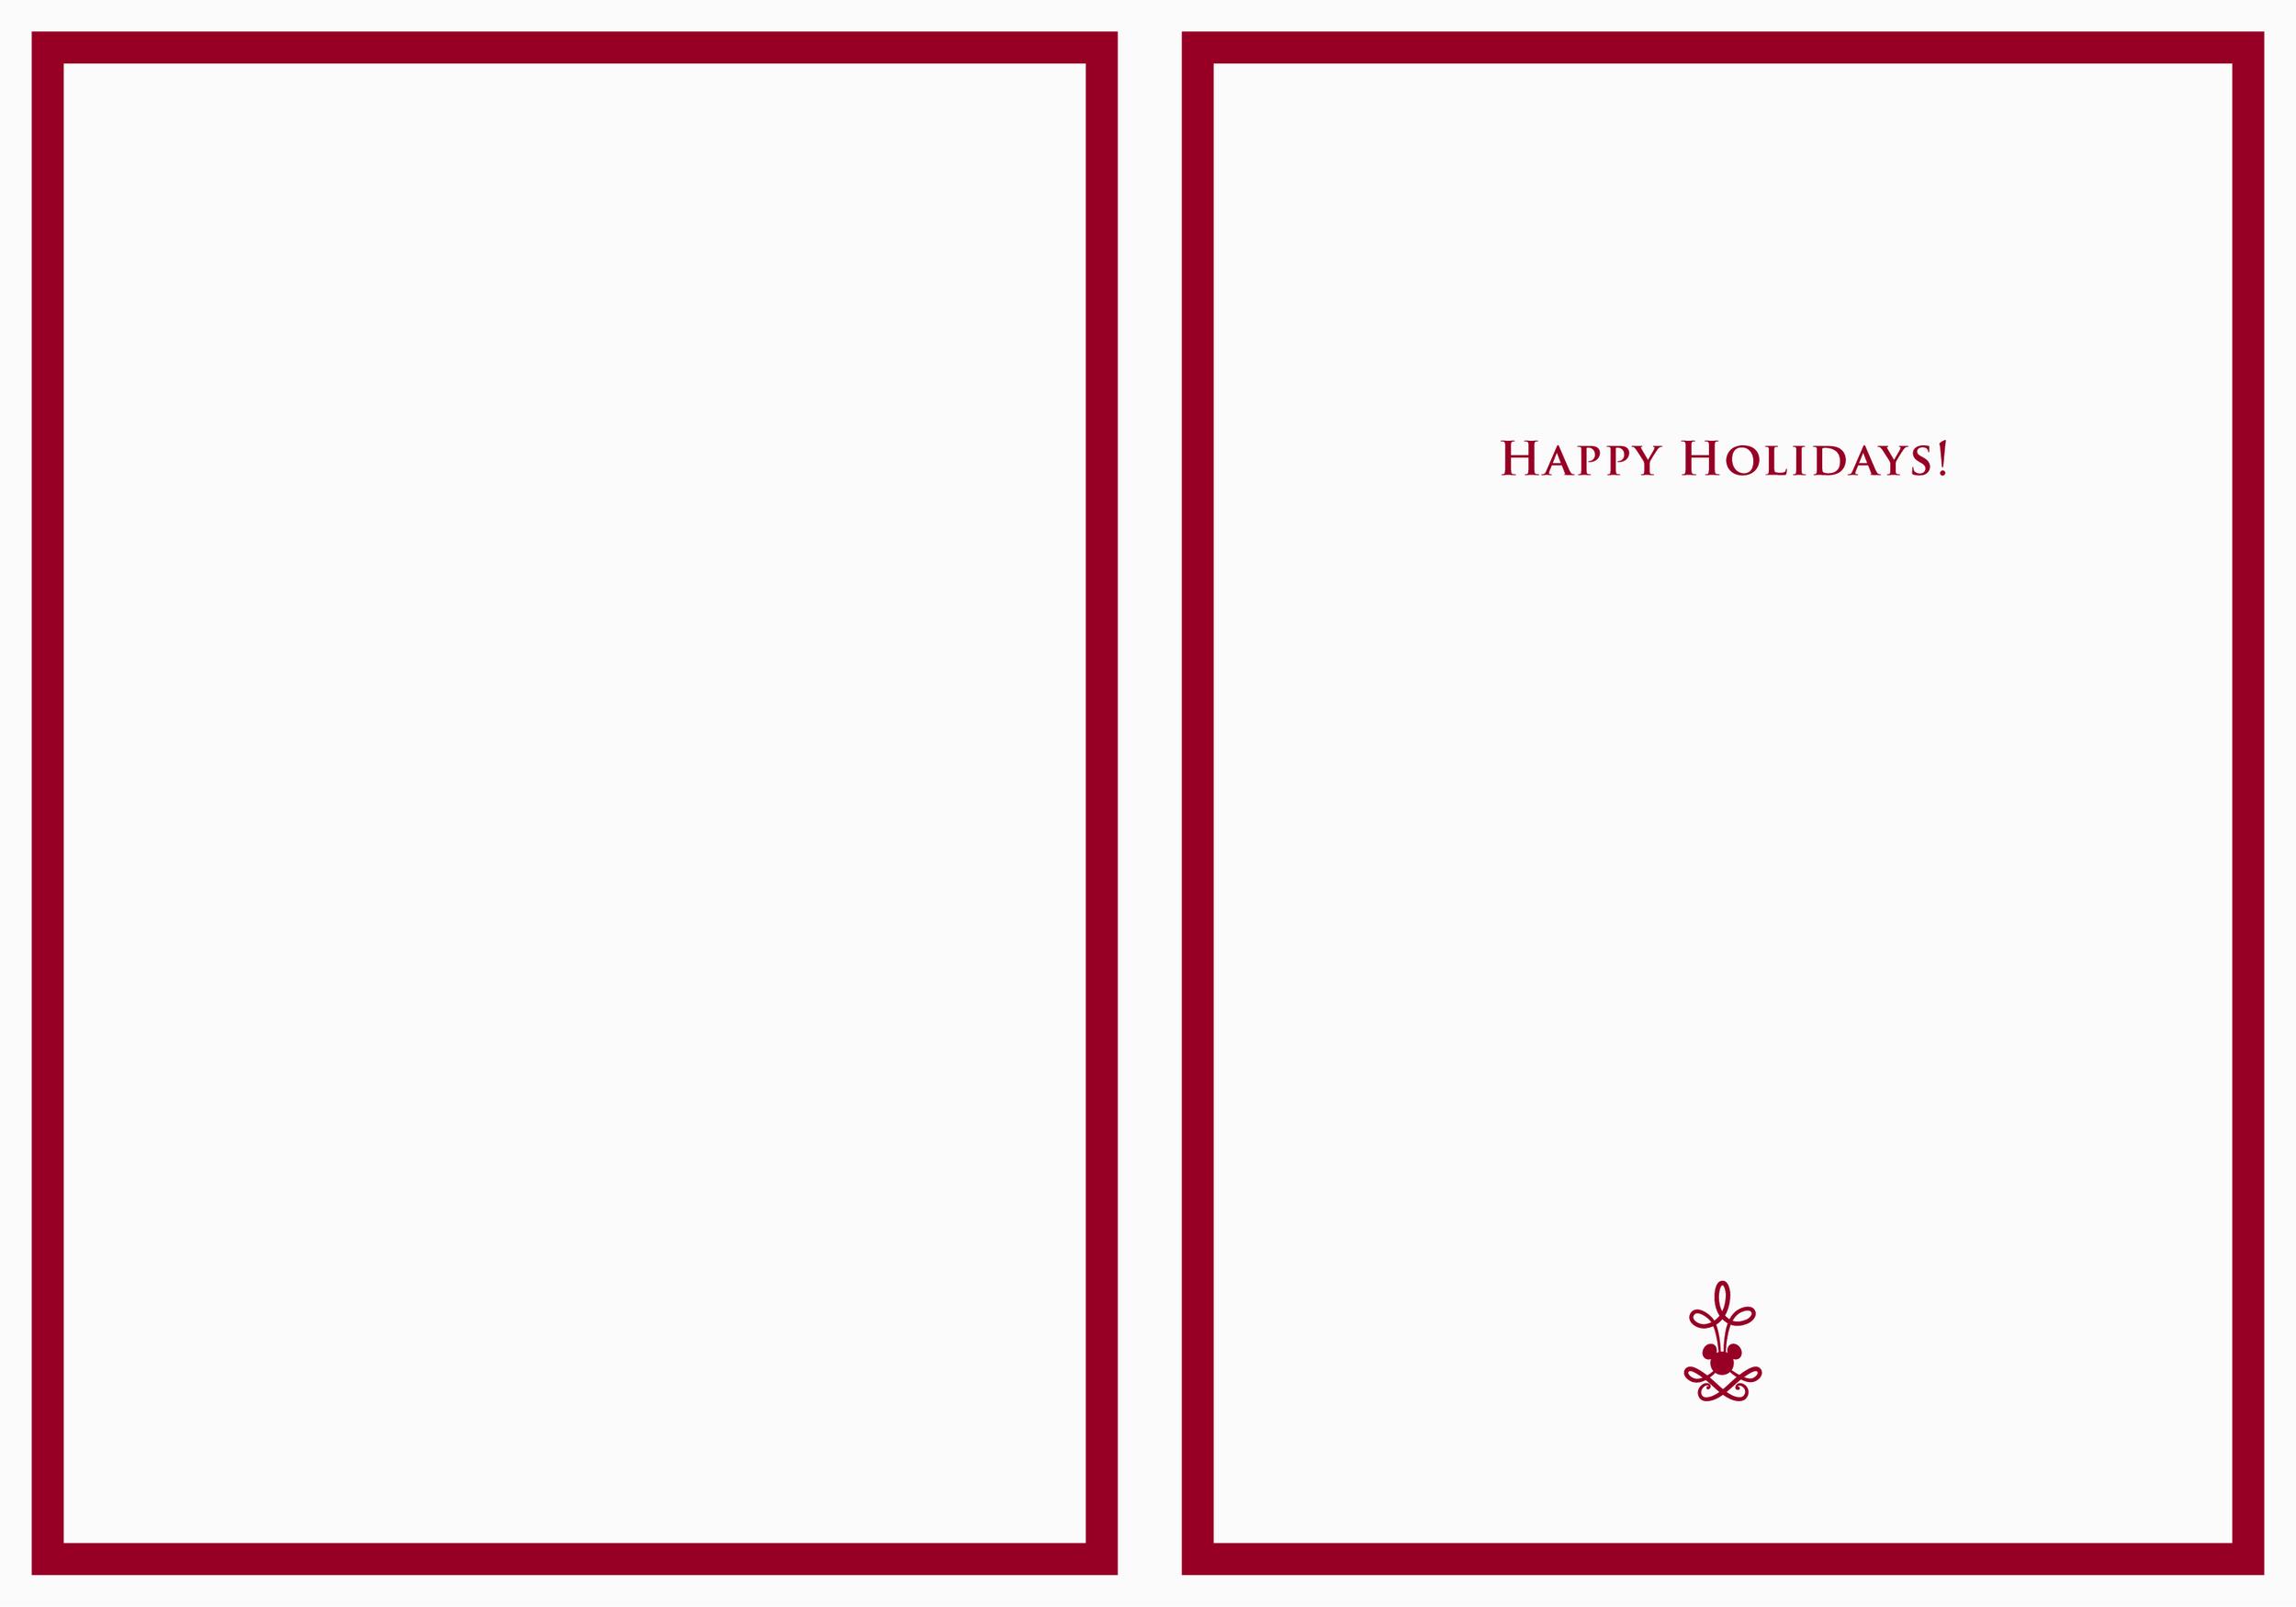 Holiday Card-07.jpg